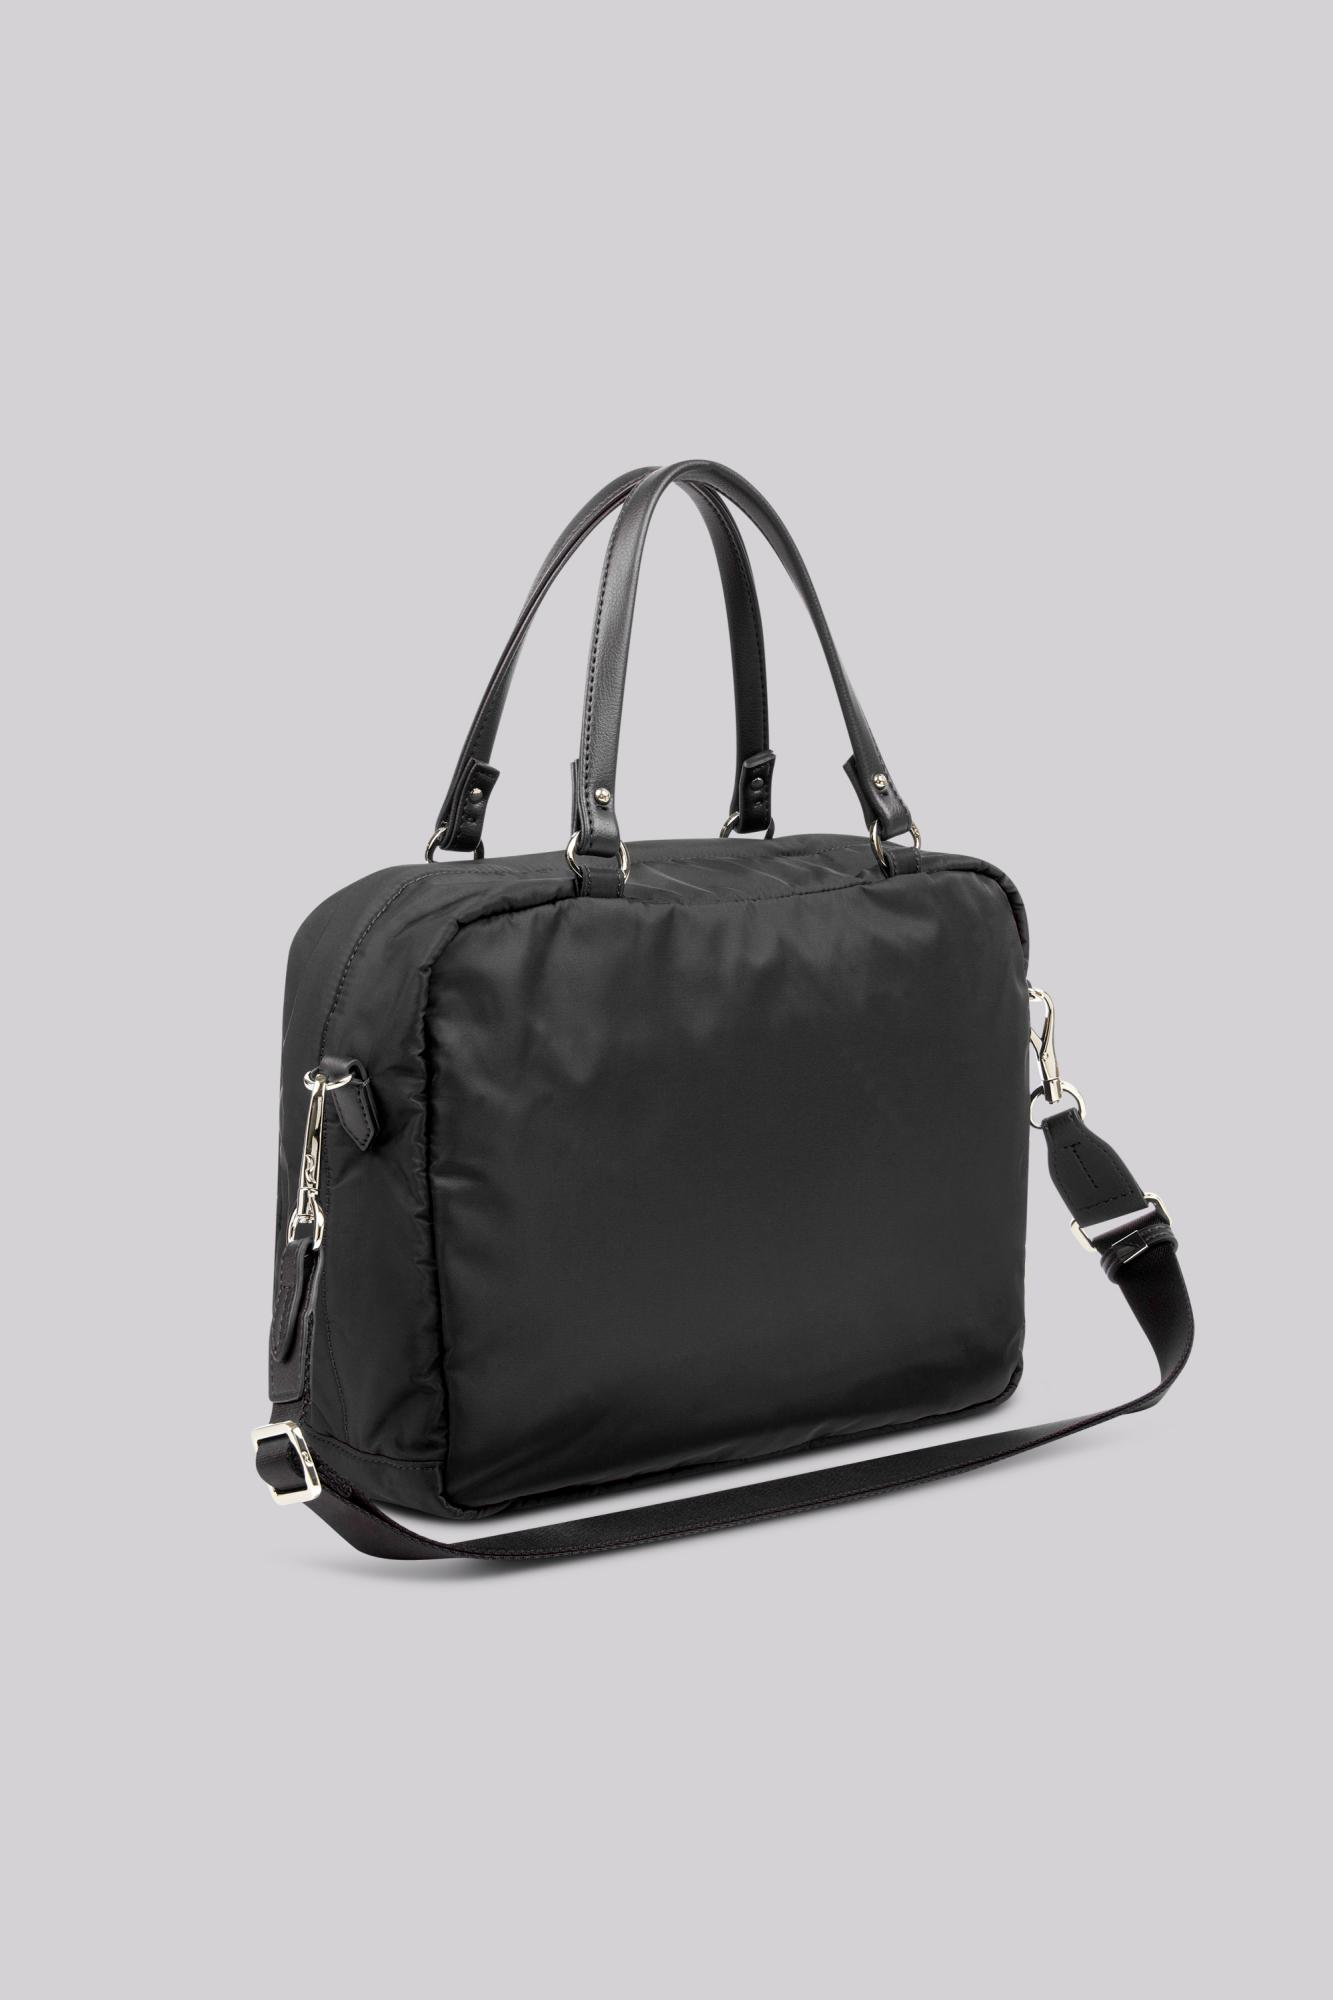 Borsa A Mano  NERO Her Bag